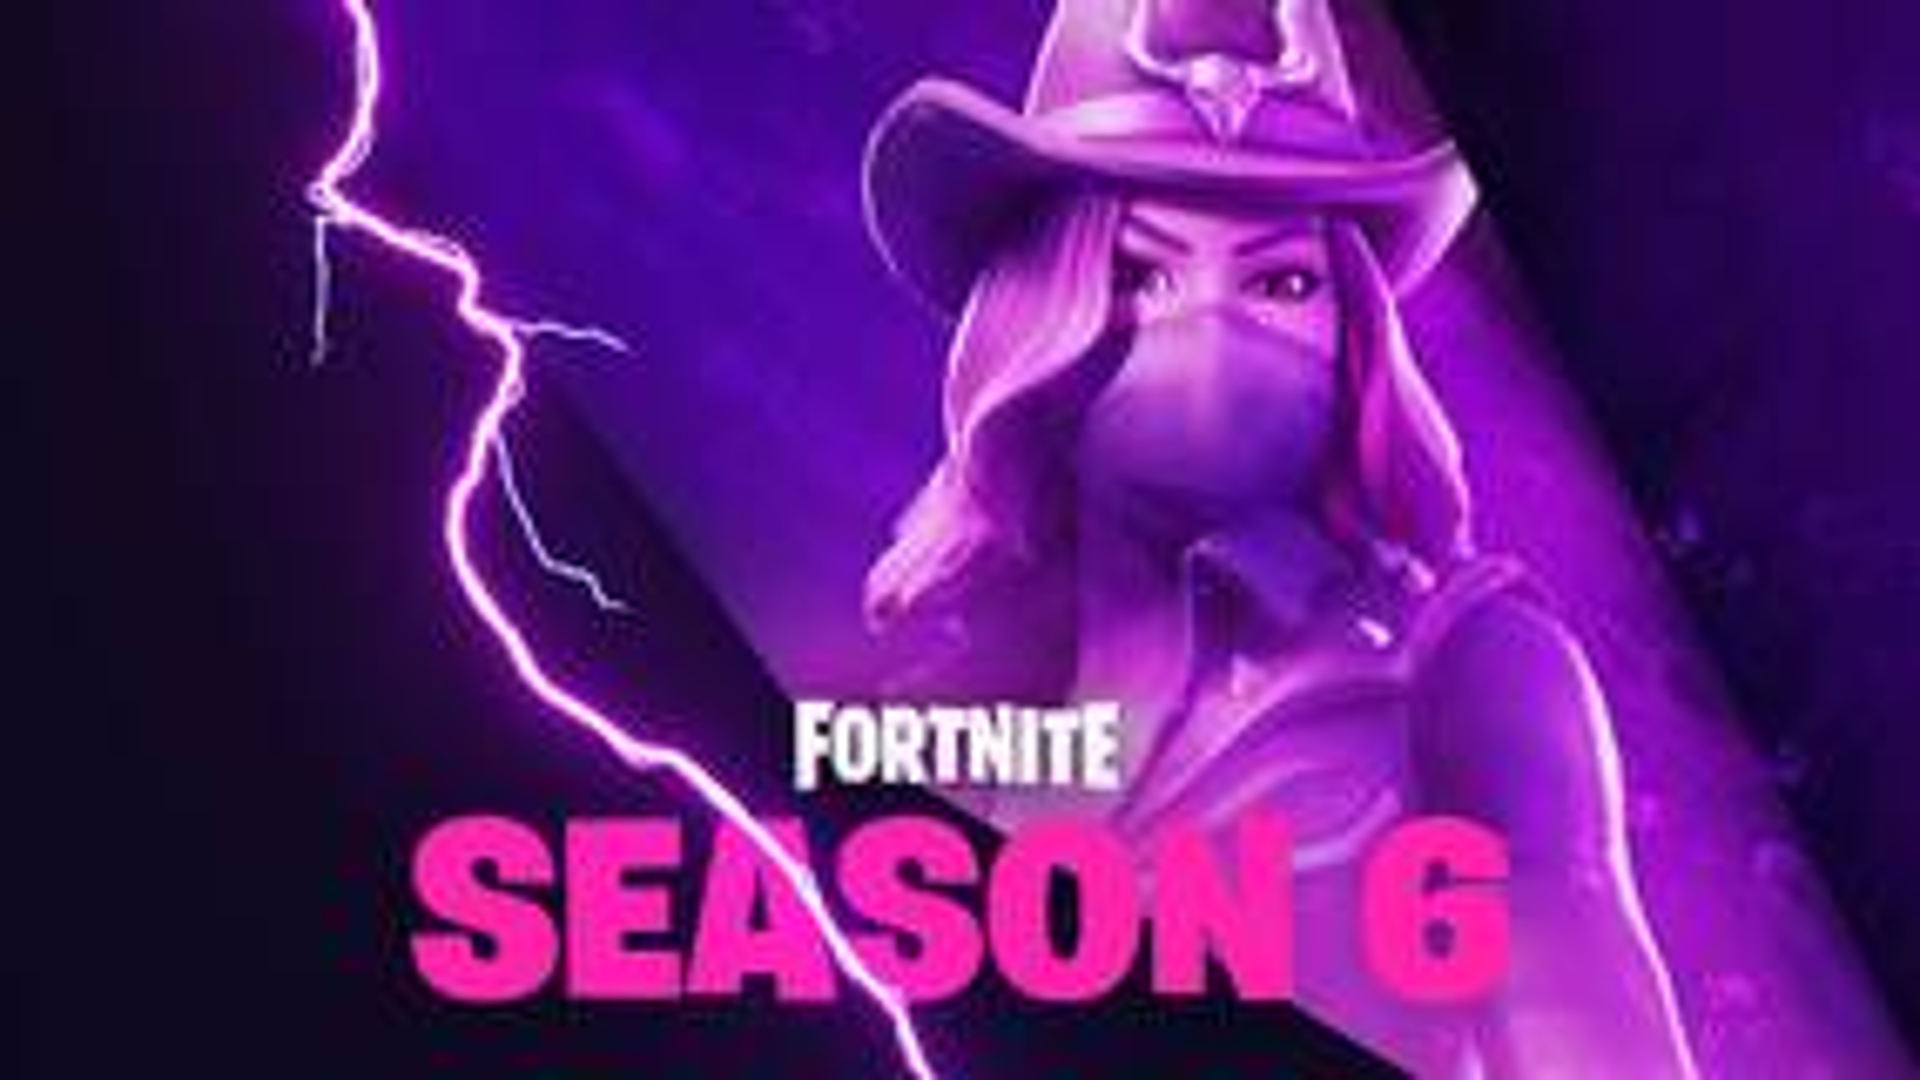 Image for Fortnite Season 6: second tease reveals bandit skin